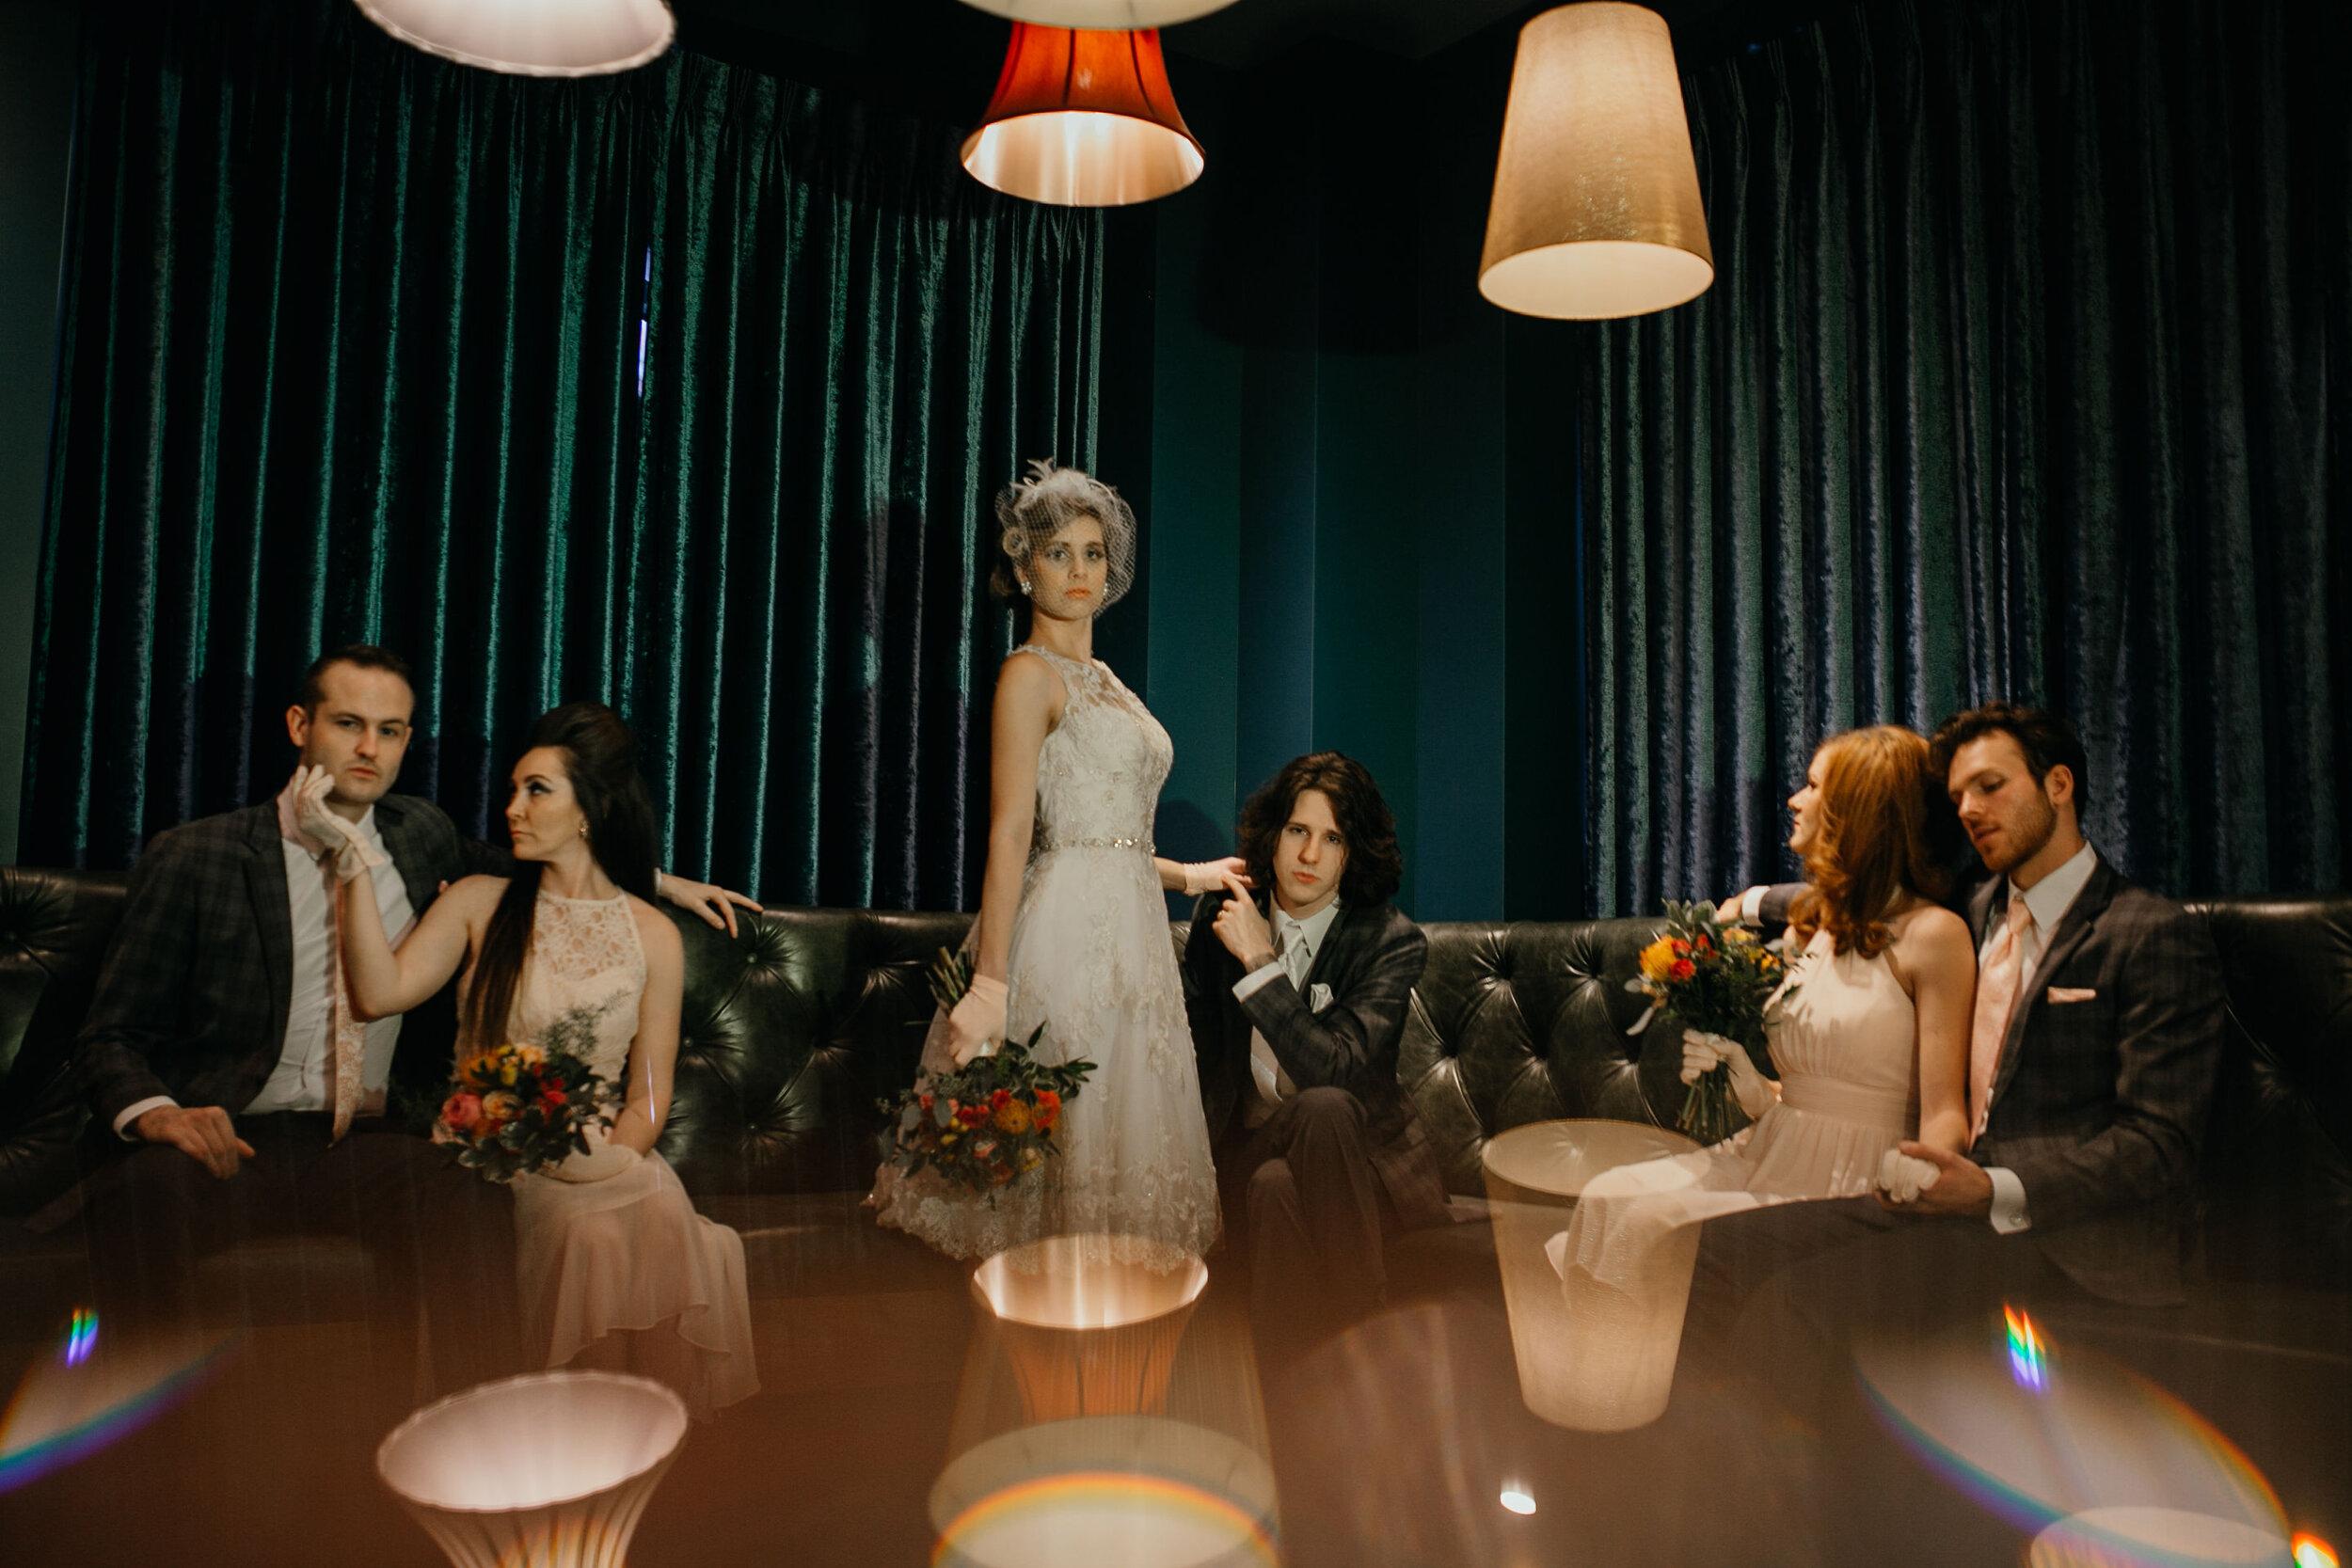 midcentury-wedding-desmoines-iowa-raelyn-ramey-photography-25.jpg